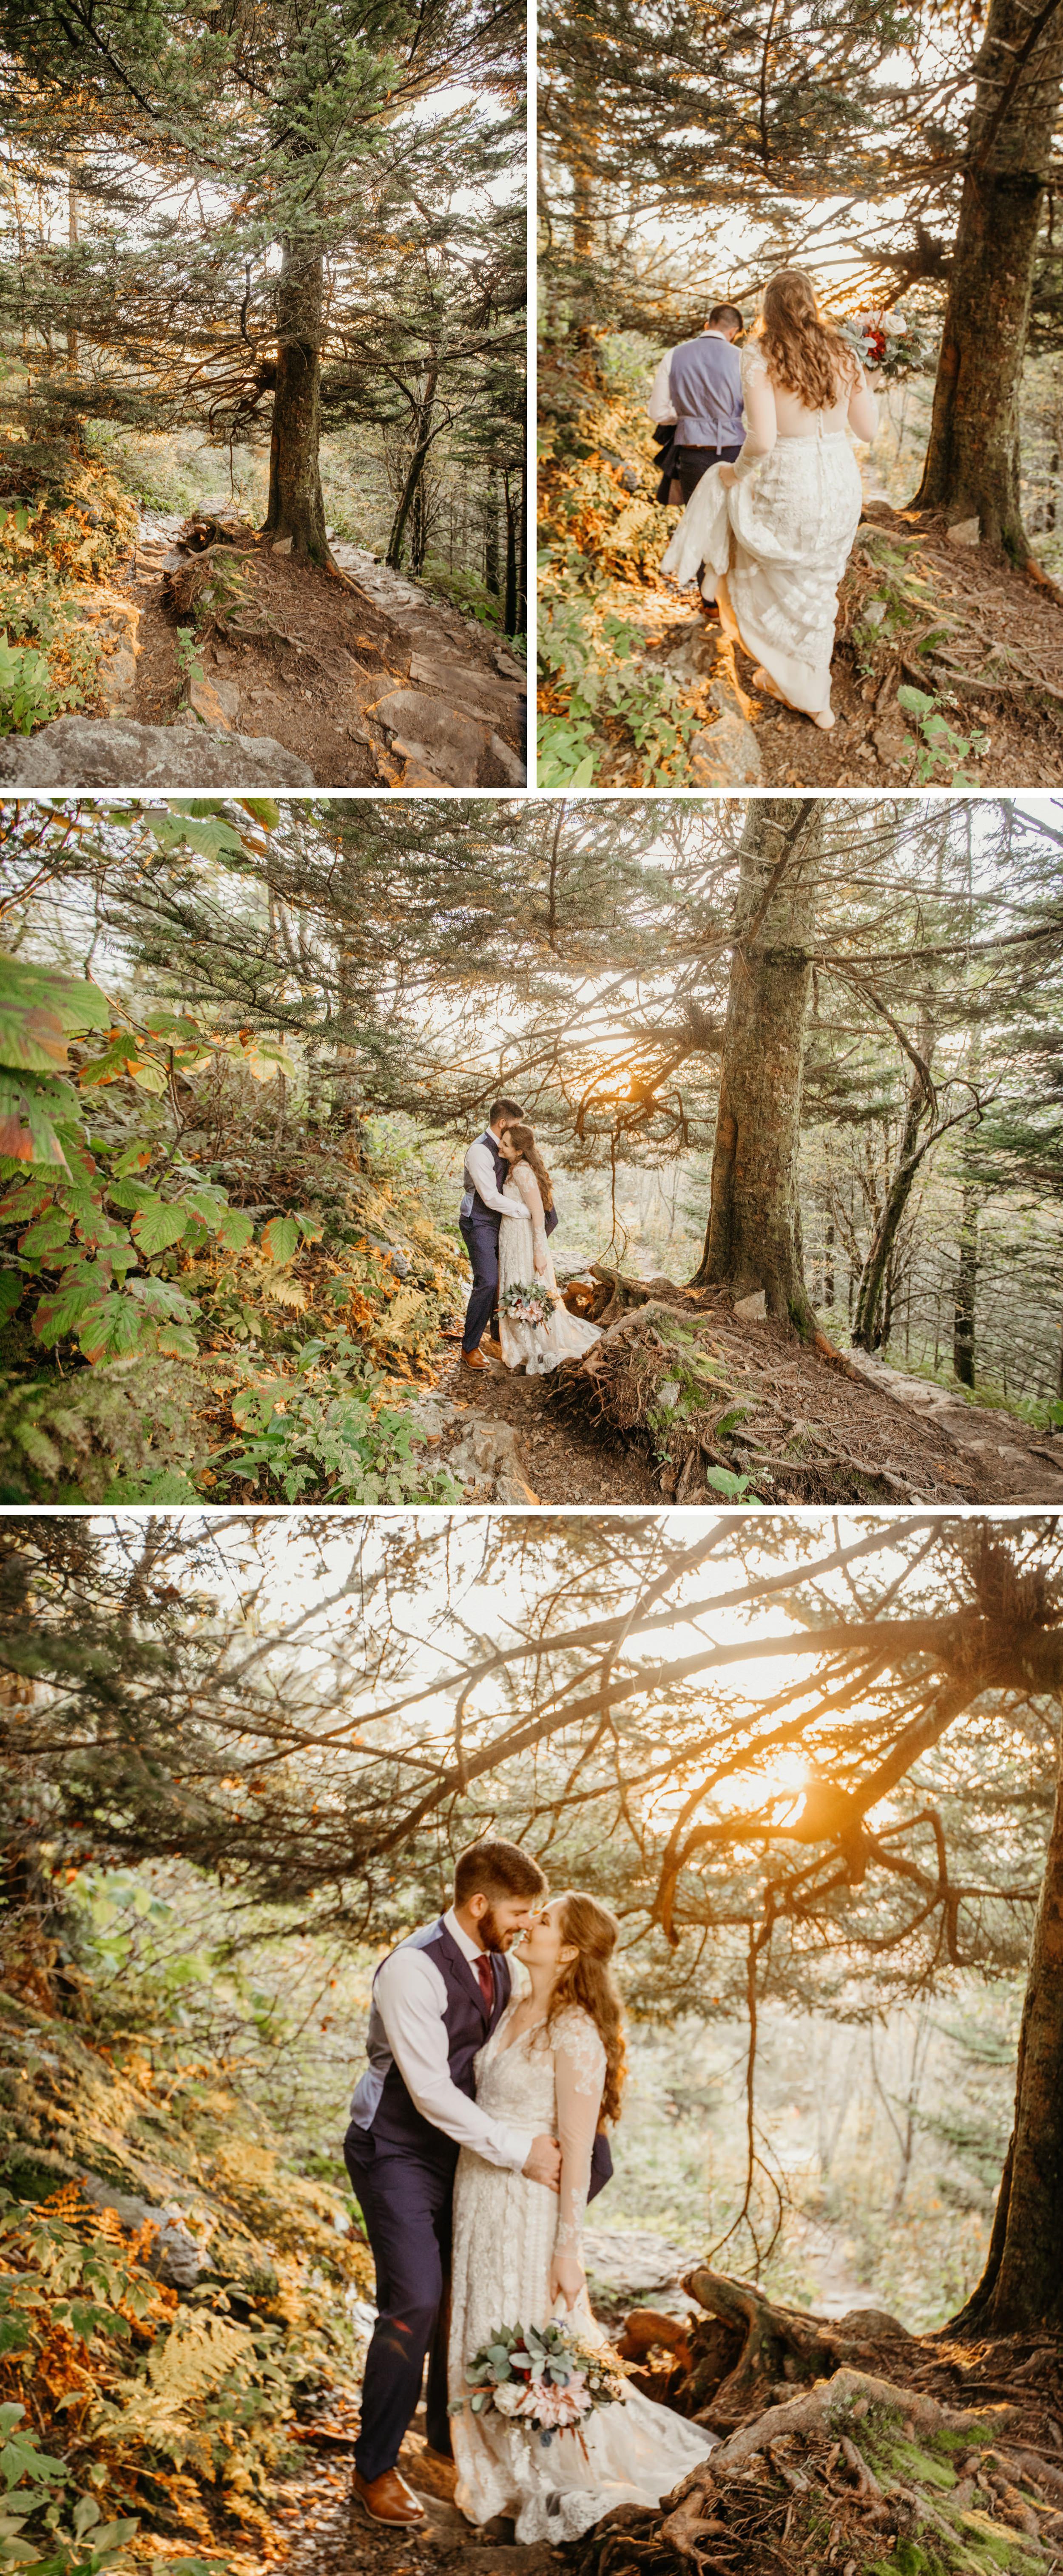 Great Smoky Mountain National Park Elopement- Cole + Rachel- Photographer Shaina DeCiryan-11.20188.jpg